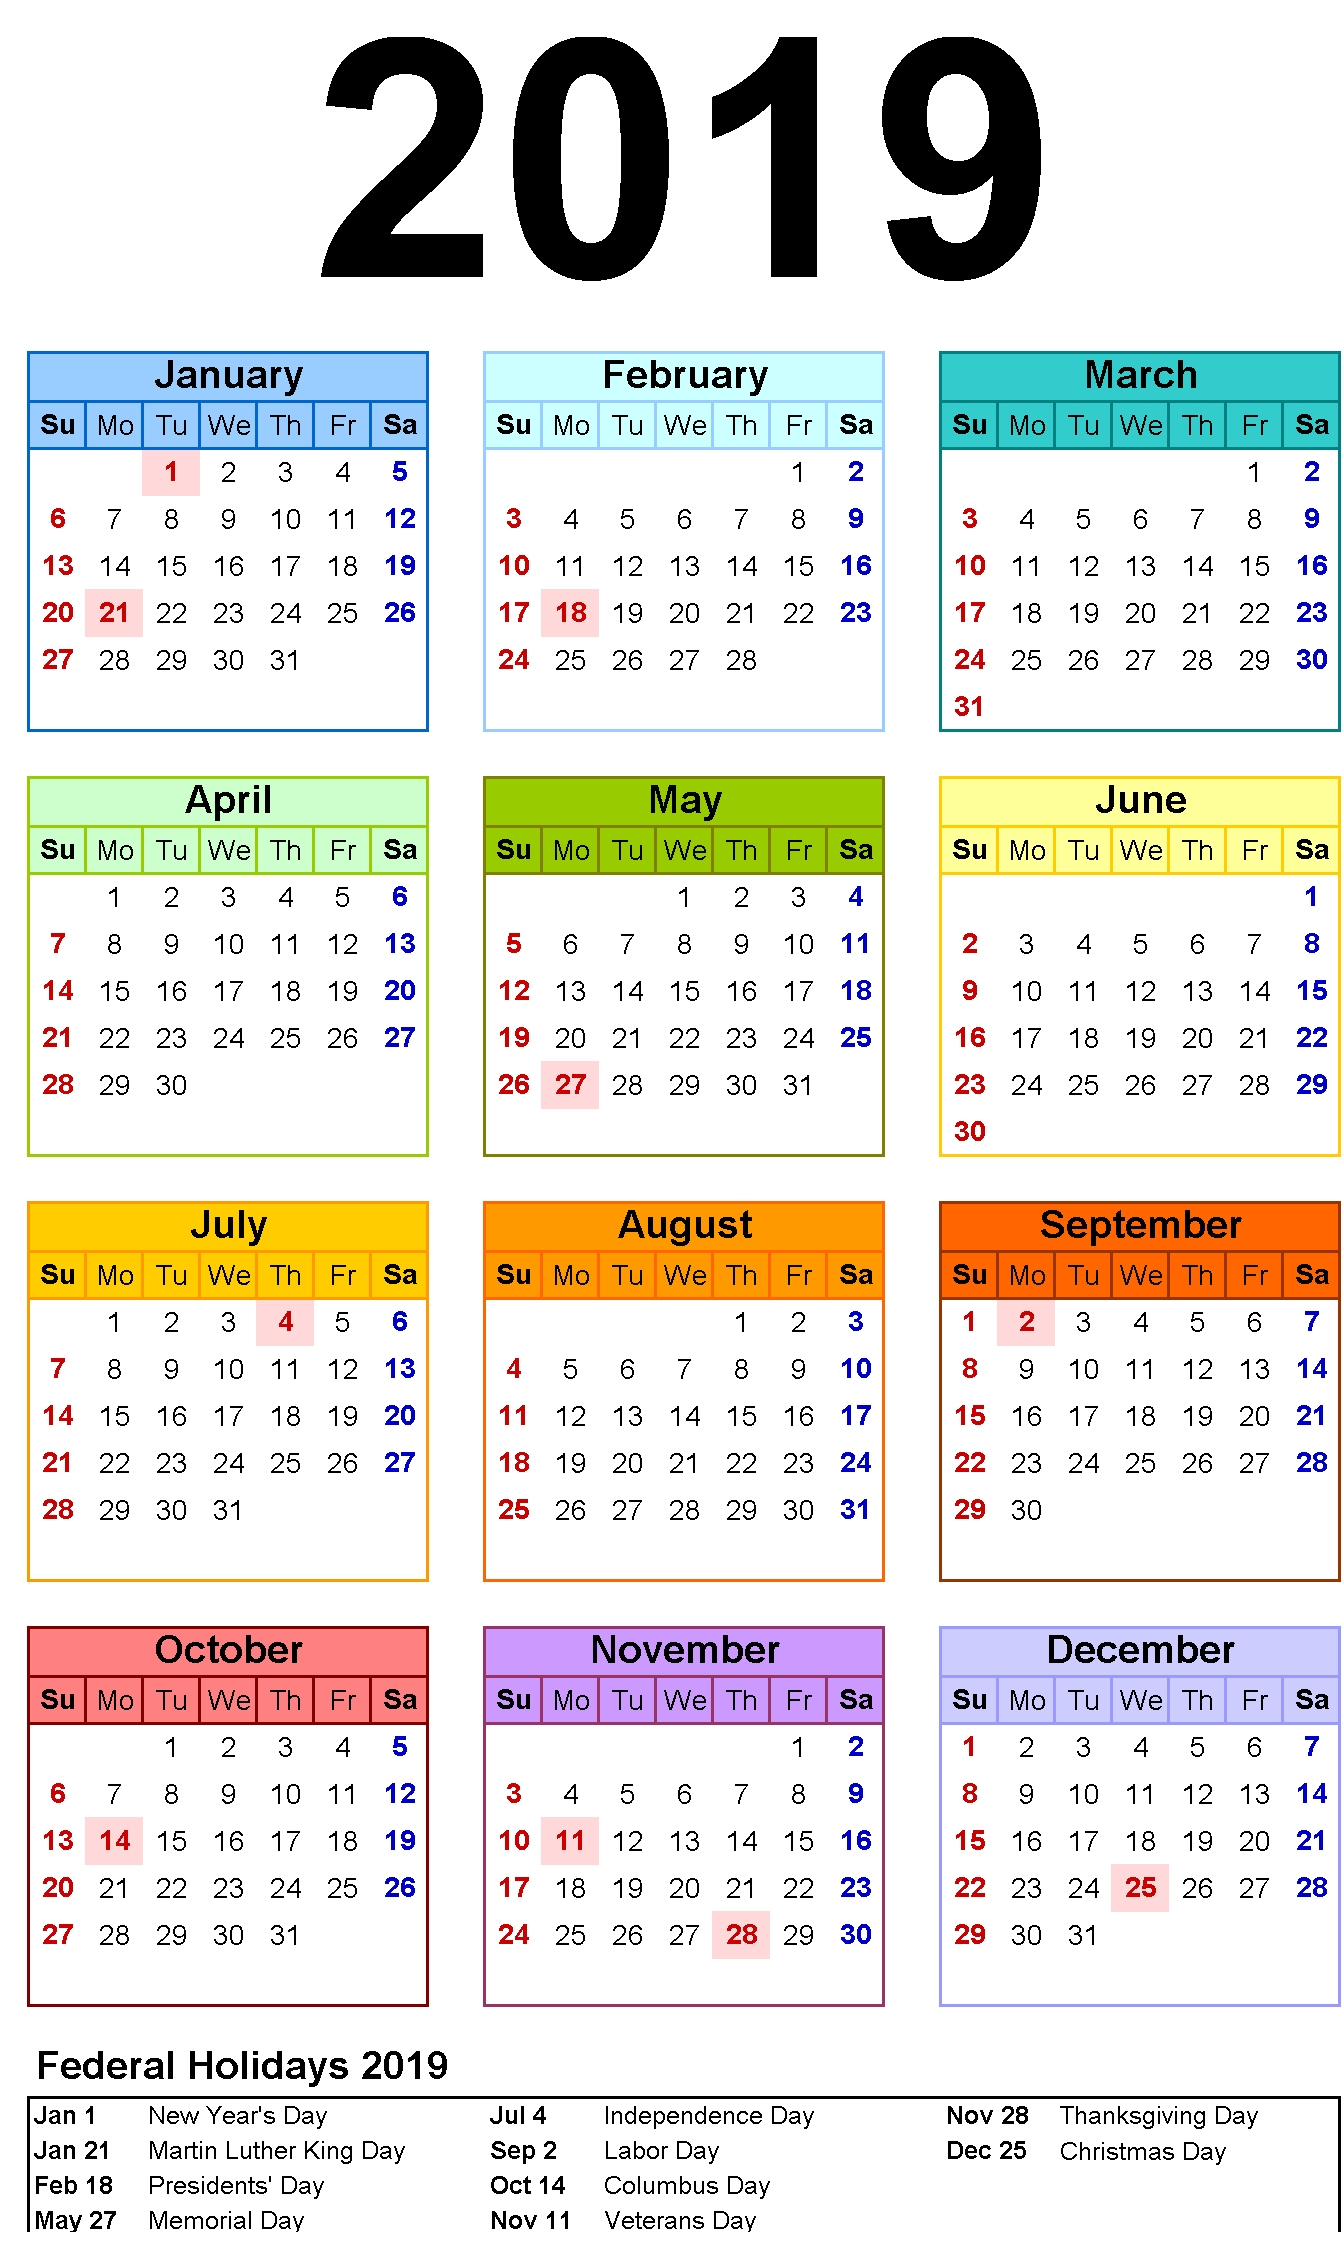 12 Month Calendar In One Page #2019Calendar #holidayscalendar 2019 Calendar 12 Pages